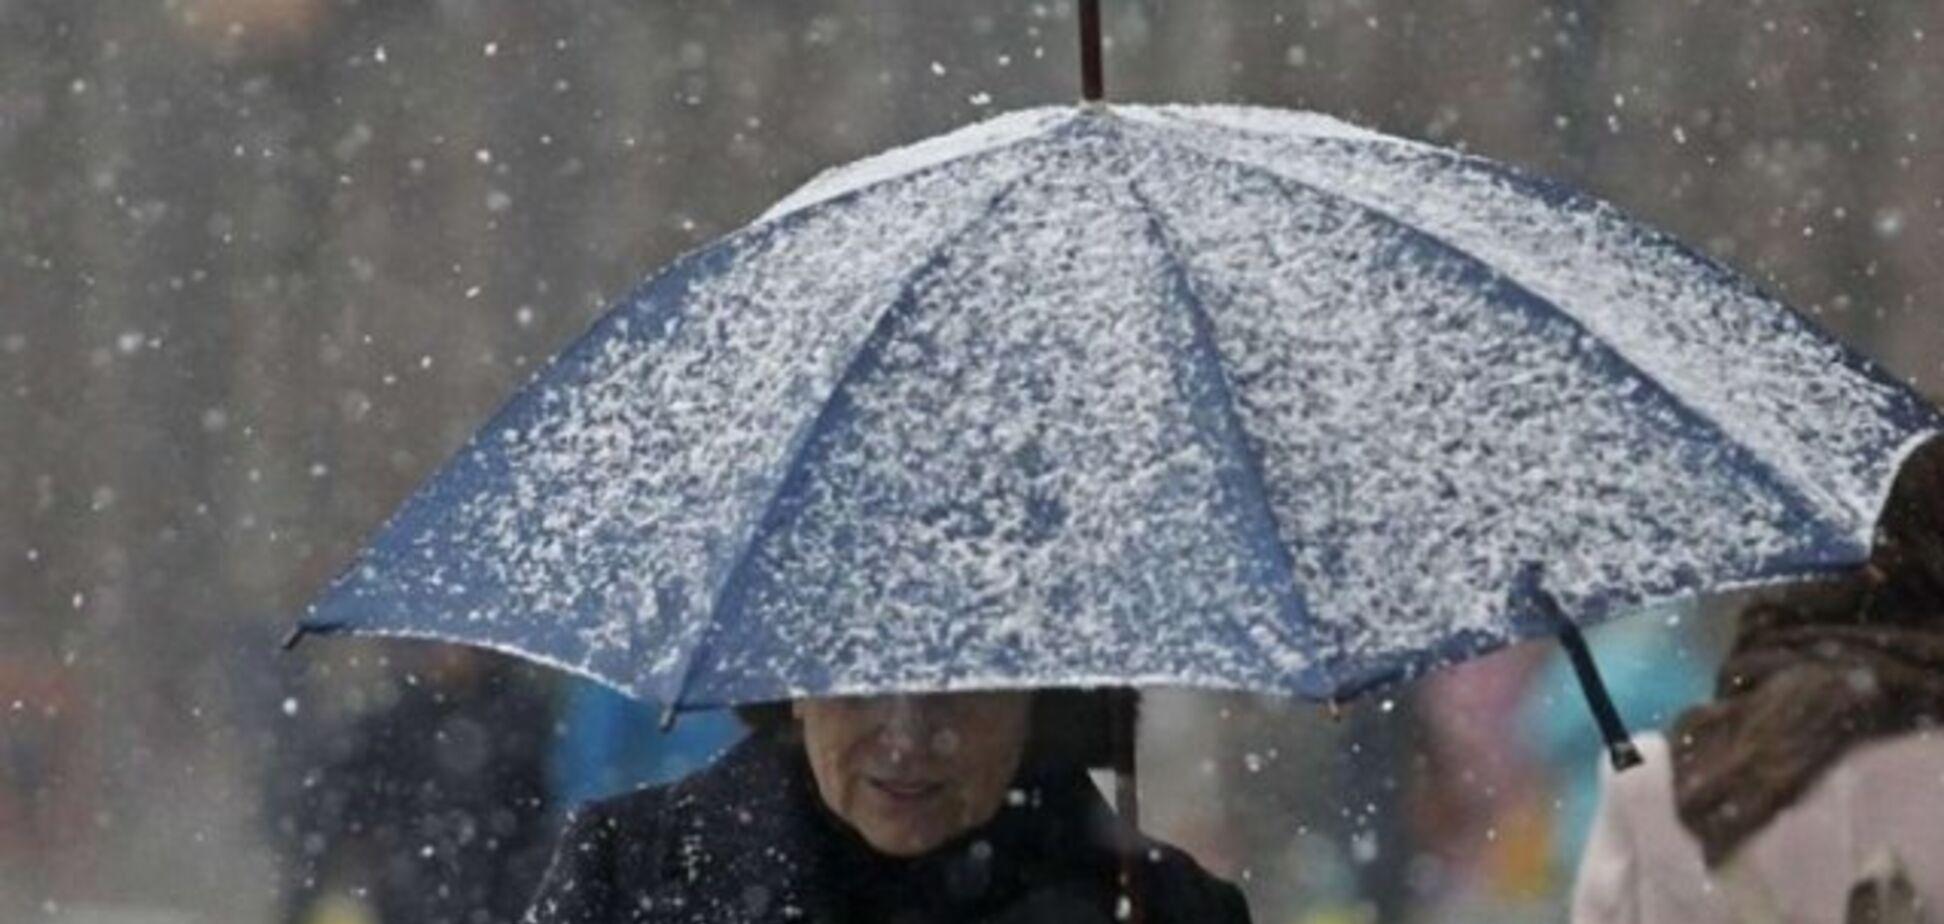 Идет зима: синоптики предупредили о резком похолодании в Украине